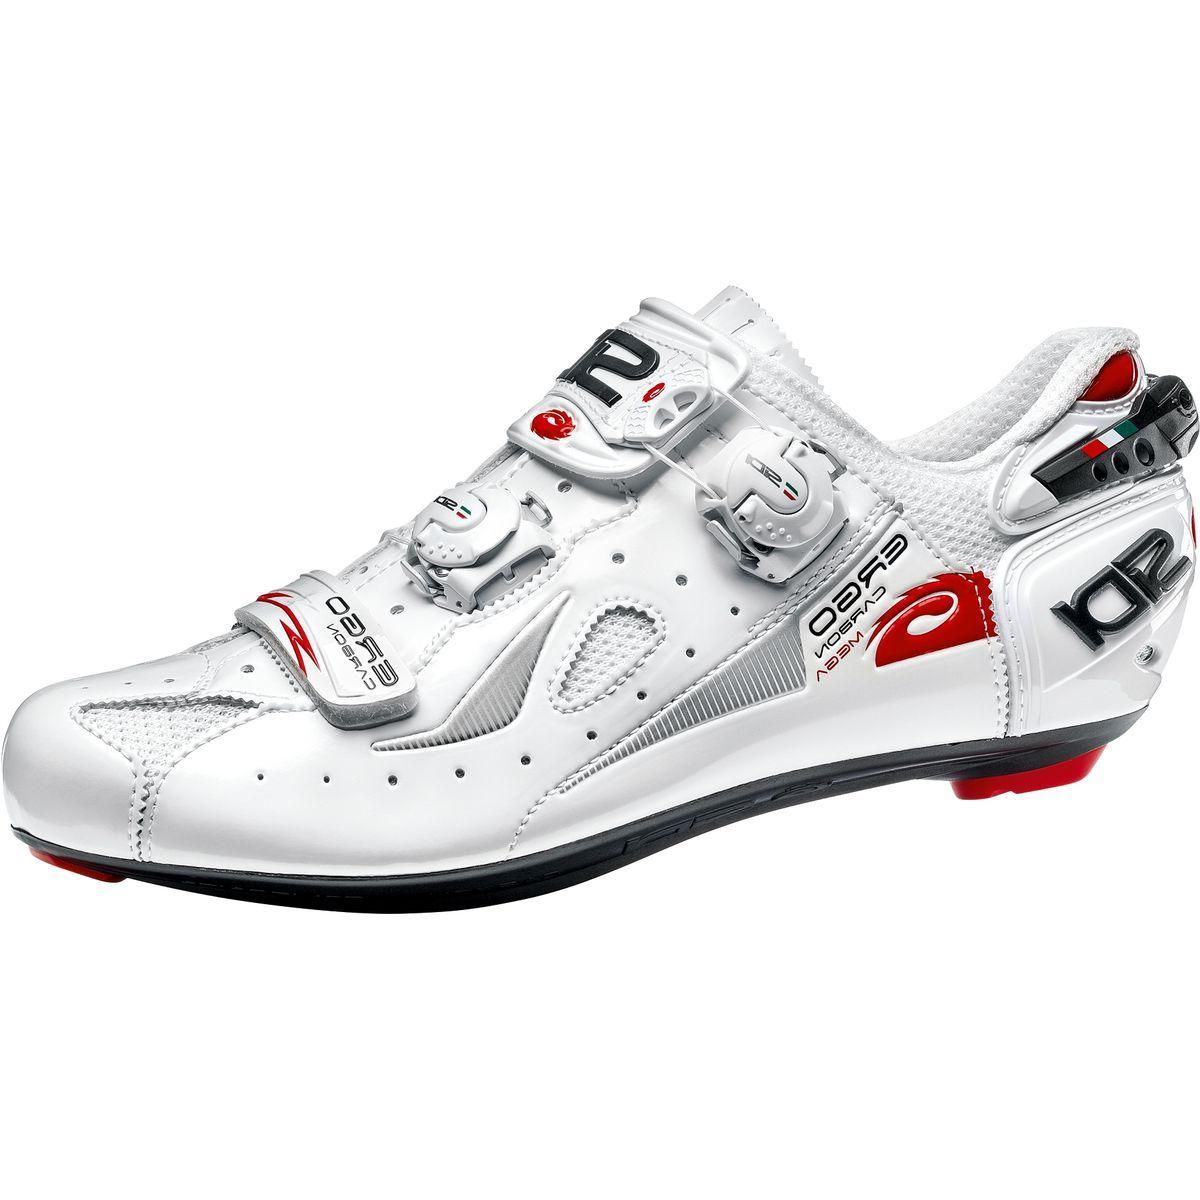 Sidi Ergo 4 Carbon Mega Cycling Shoe - Men's